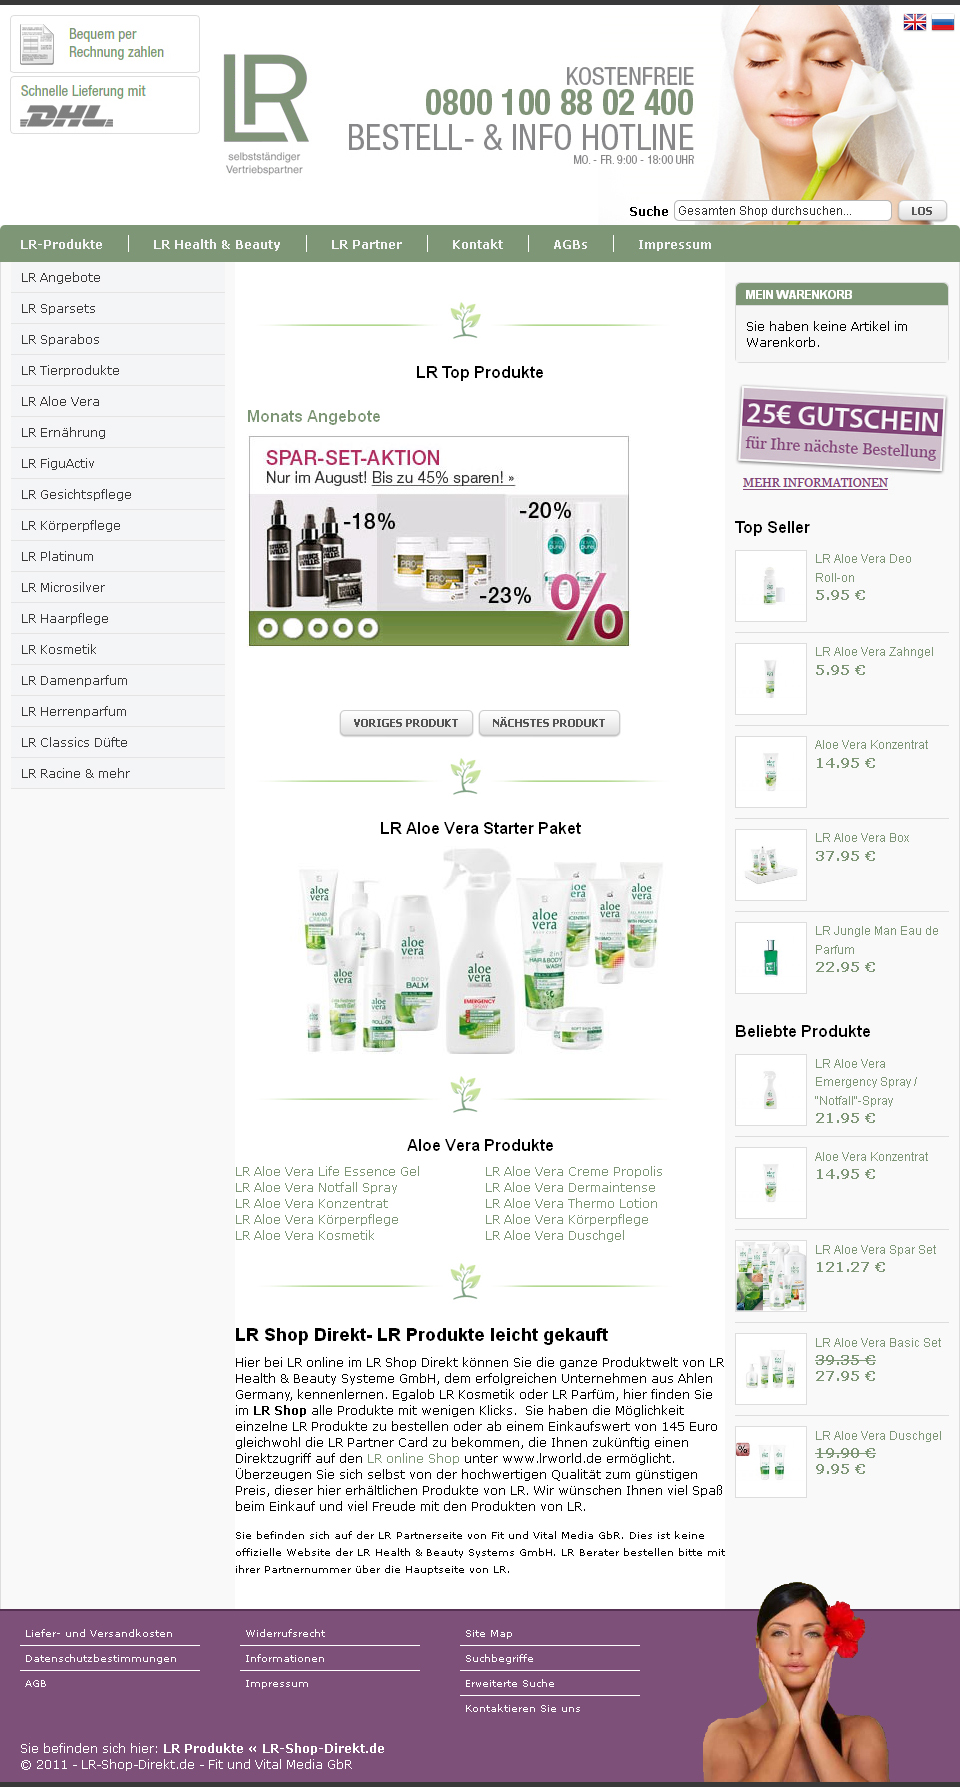 webentwicklung mediasky gmbh agentur f r zielgruppenmarketing. Black Bedroom Furniture Sets. Home Design Ideas